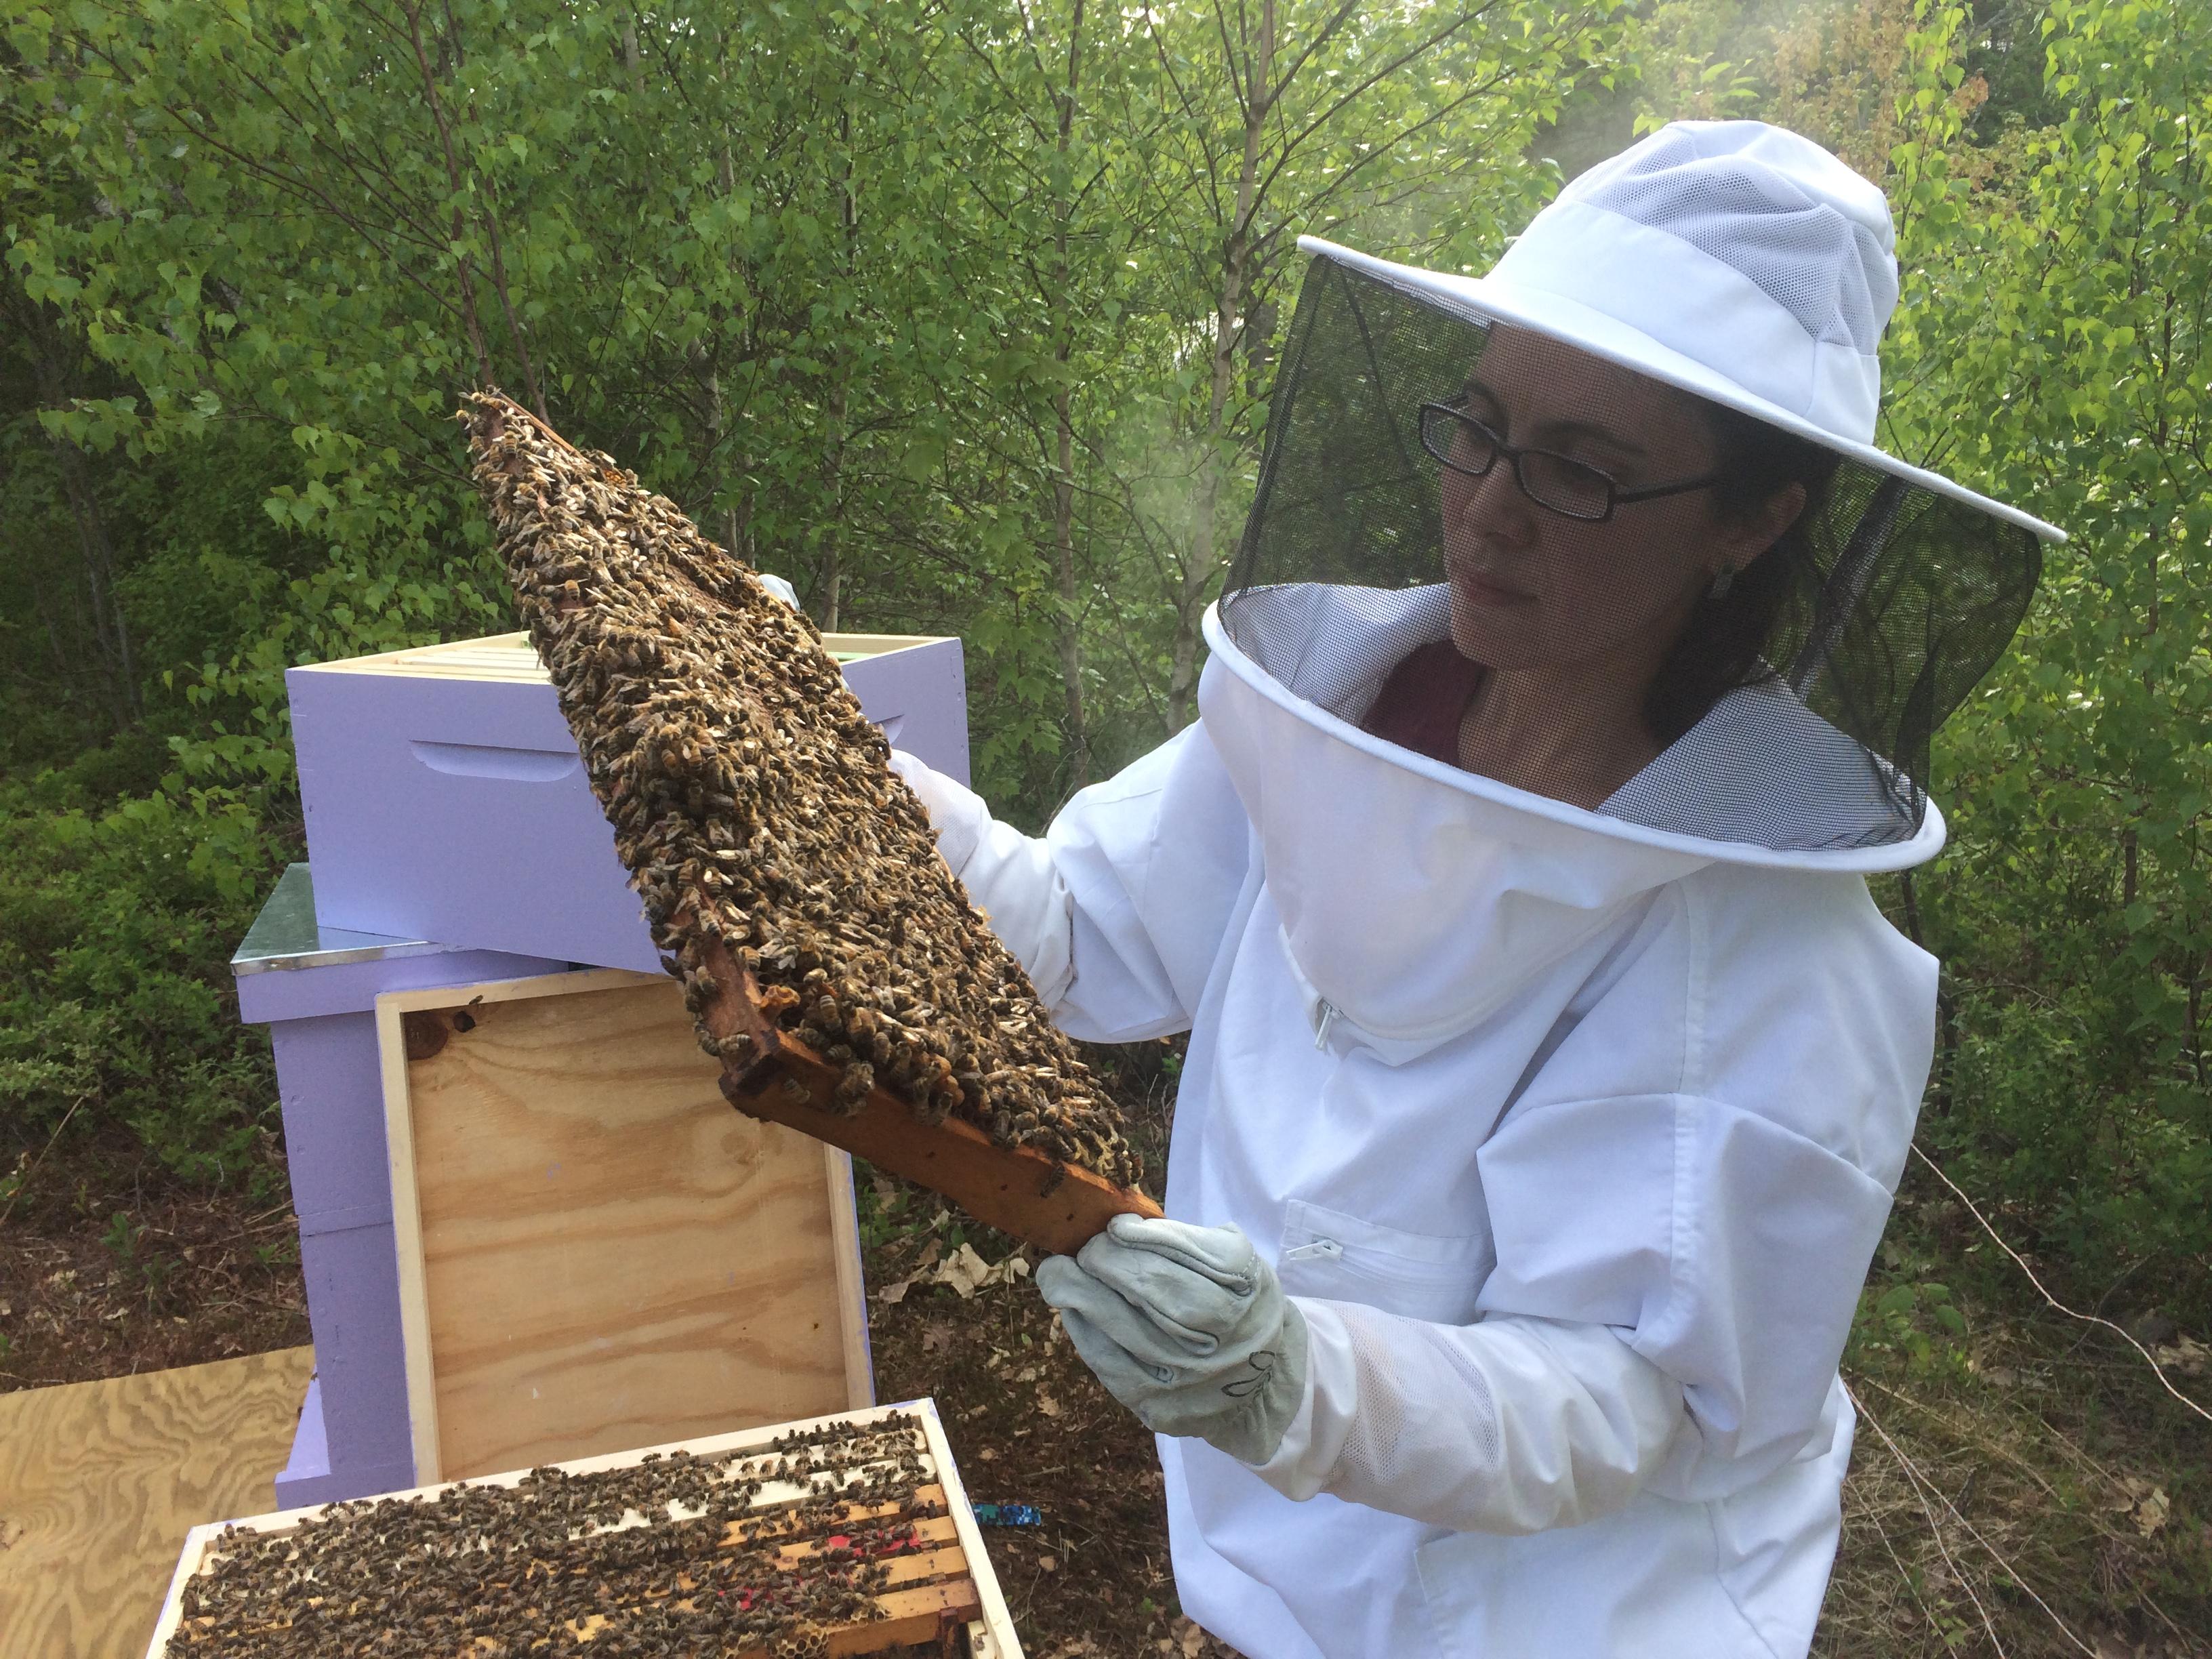 Renata inspecting her bees